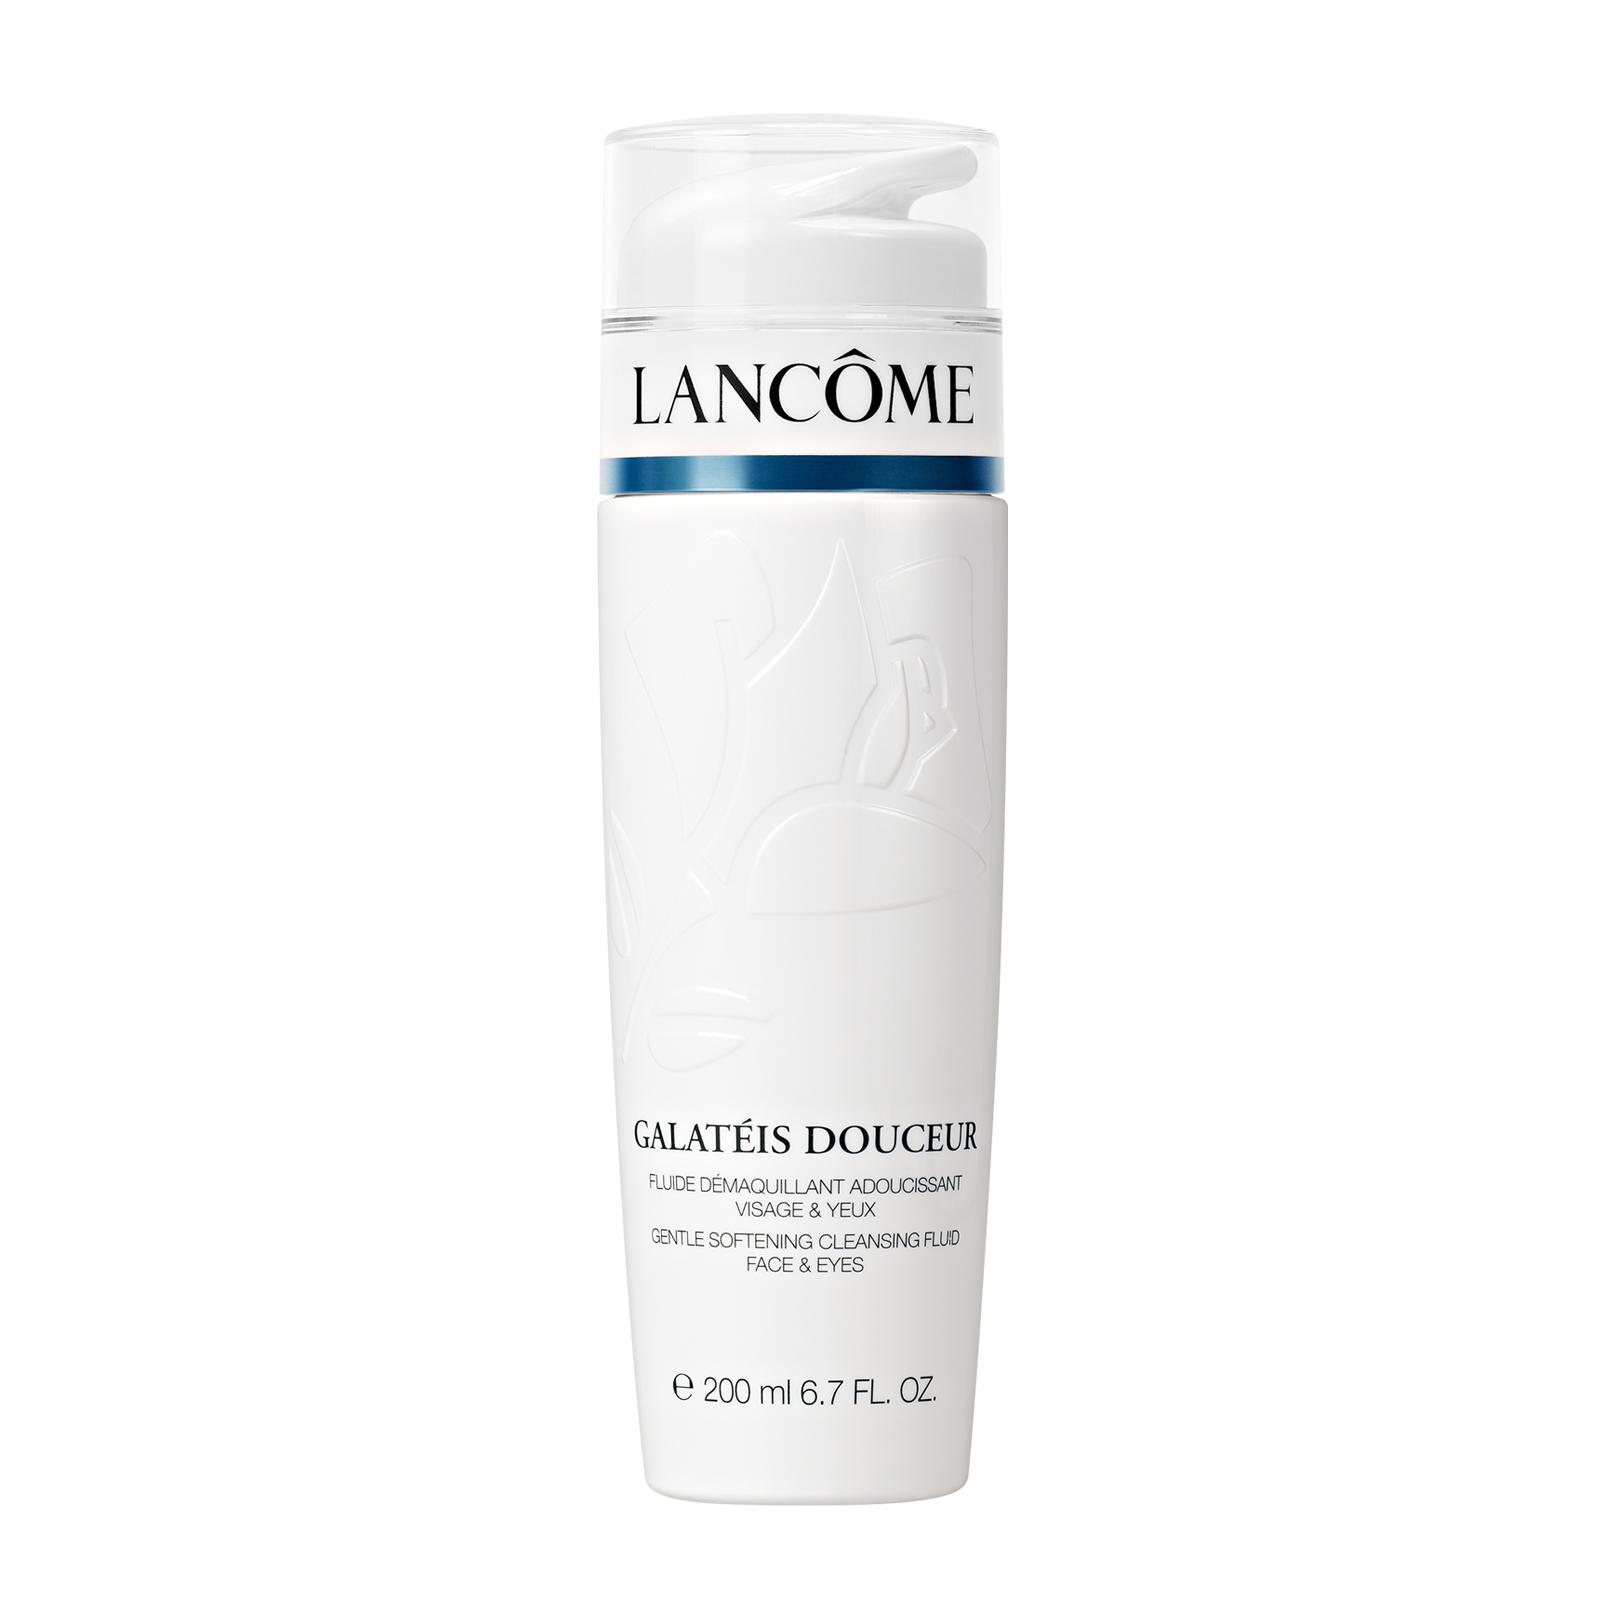 Lancome Galatis Douceur  Detergente Viso 200 ML